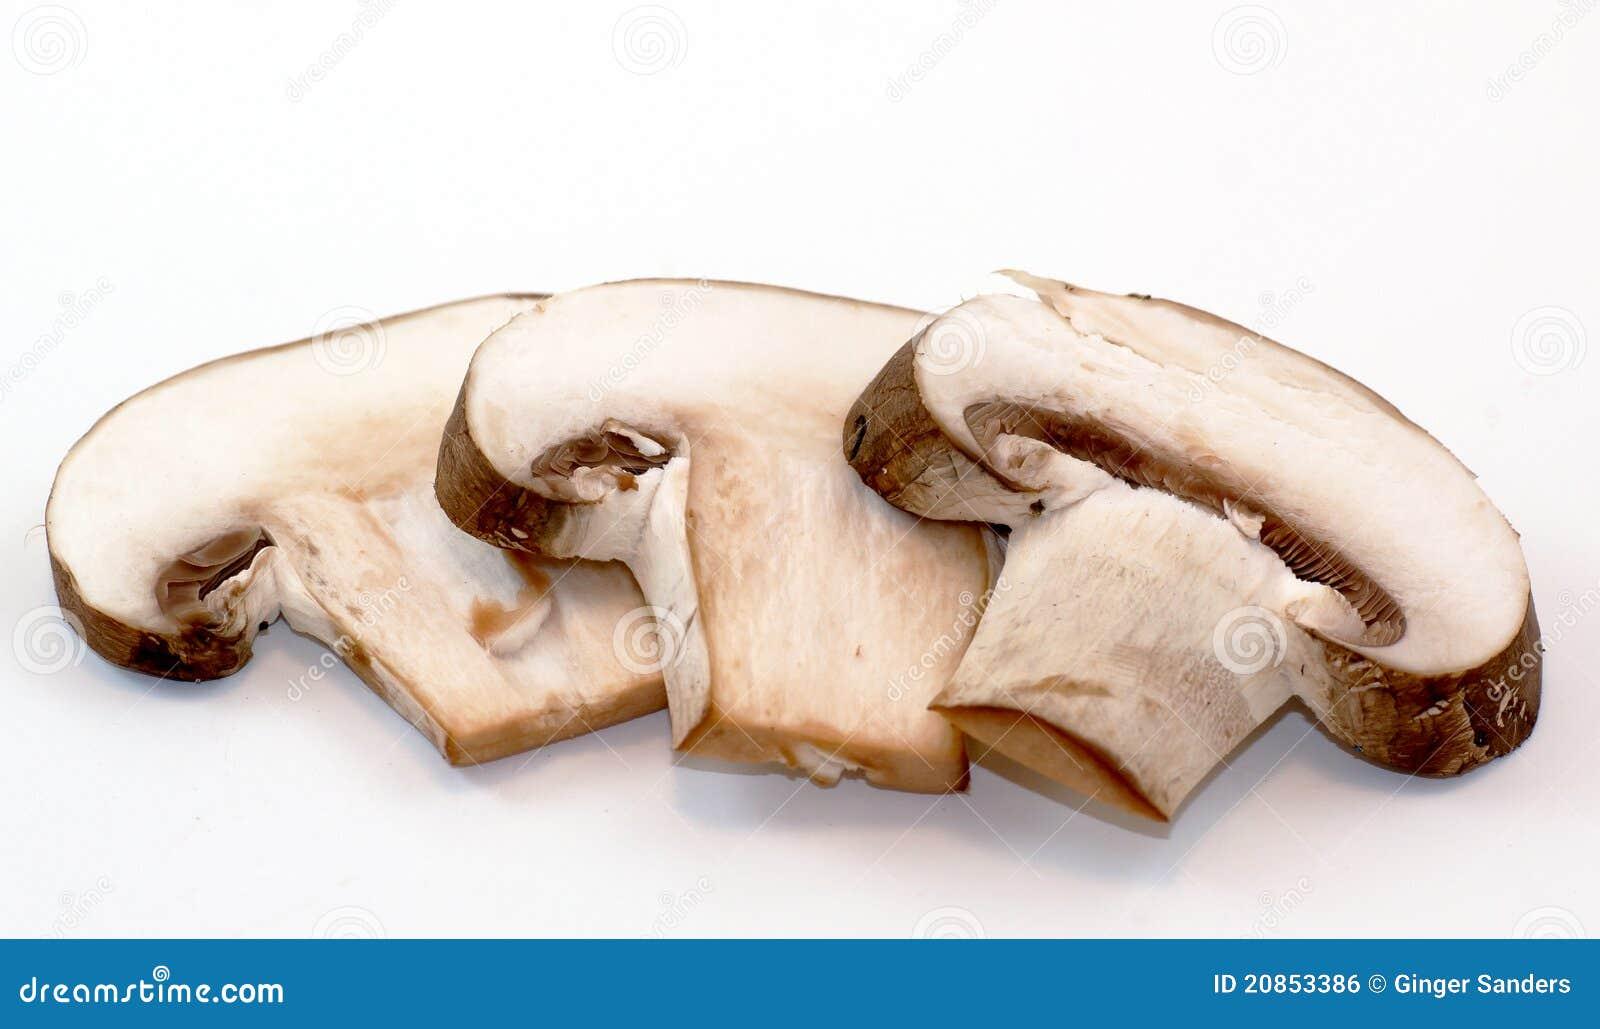 Porcini Mushroom Slices On White Background